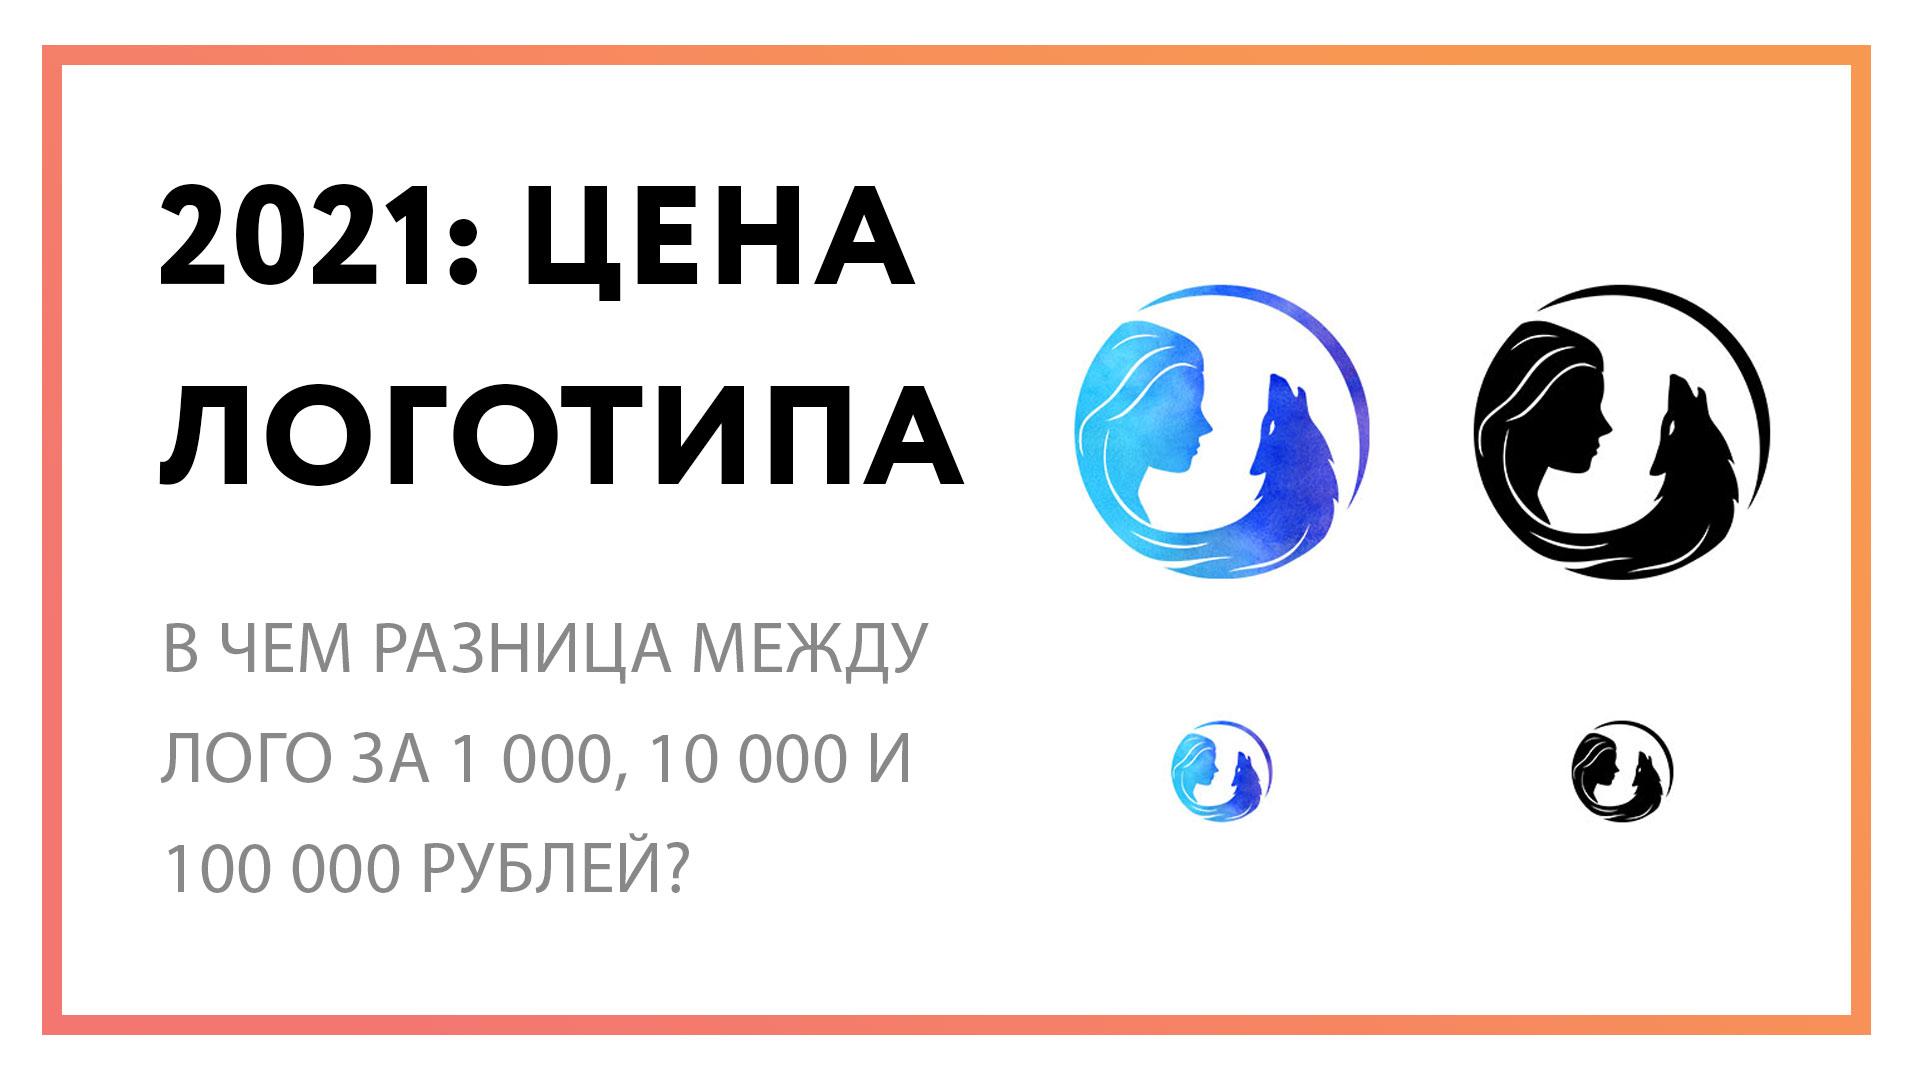 Цена-логотипа-в-2021-году----разница-между-лого-за-1000,-10000-и-100000-рублей.jpg